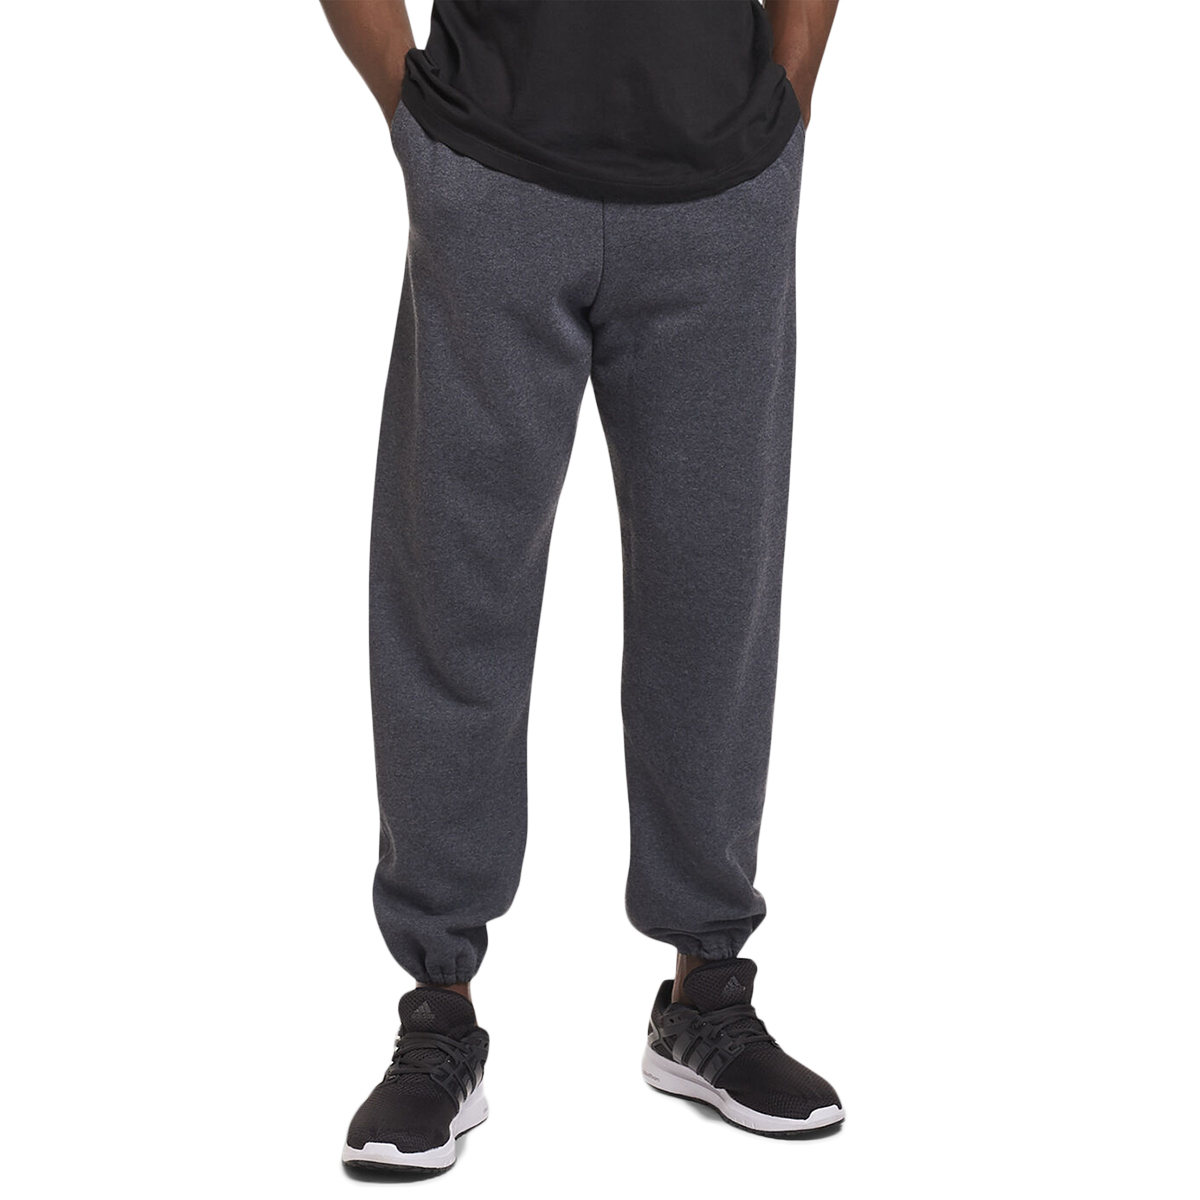 Russell Athletics Men's Dripower Fleece Pants - Black, M